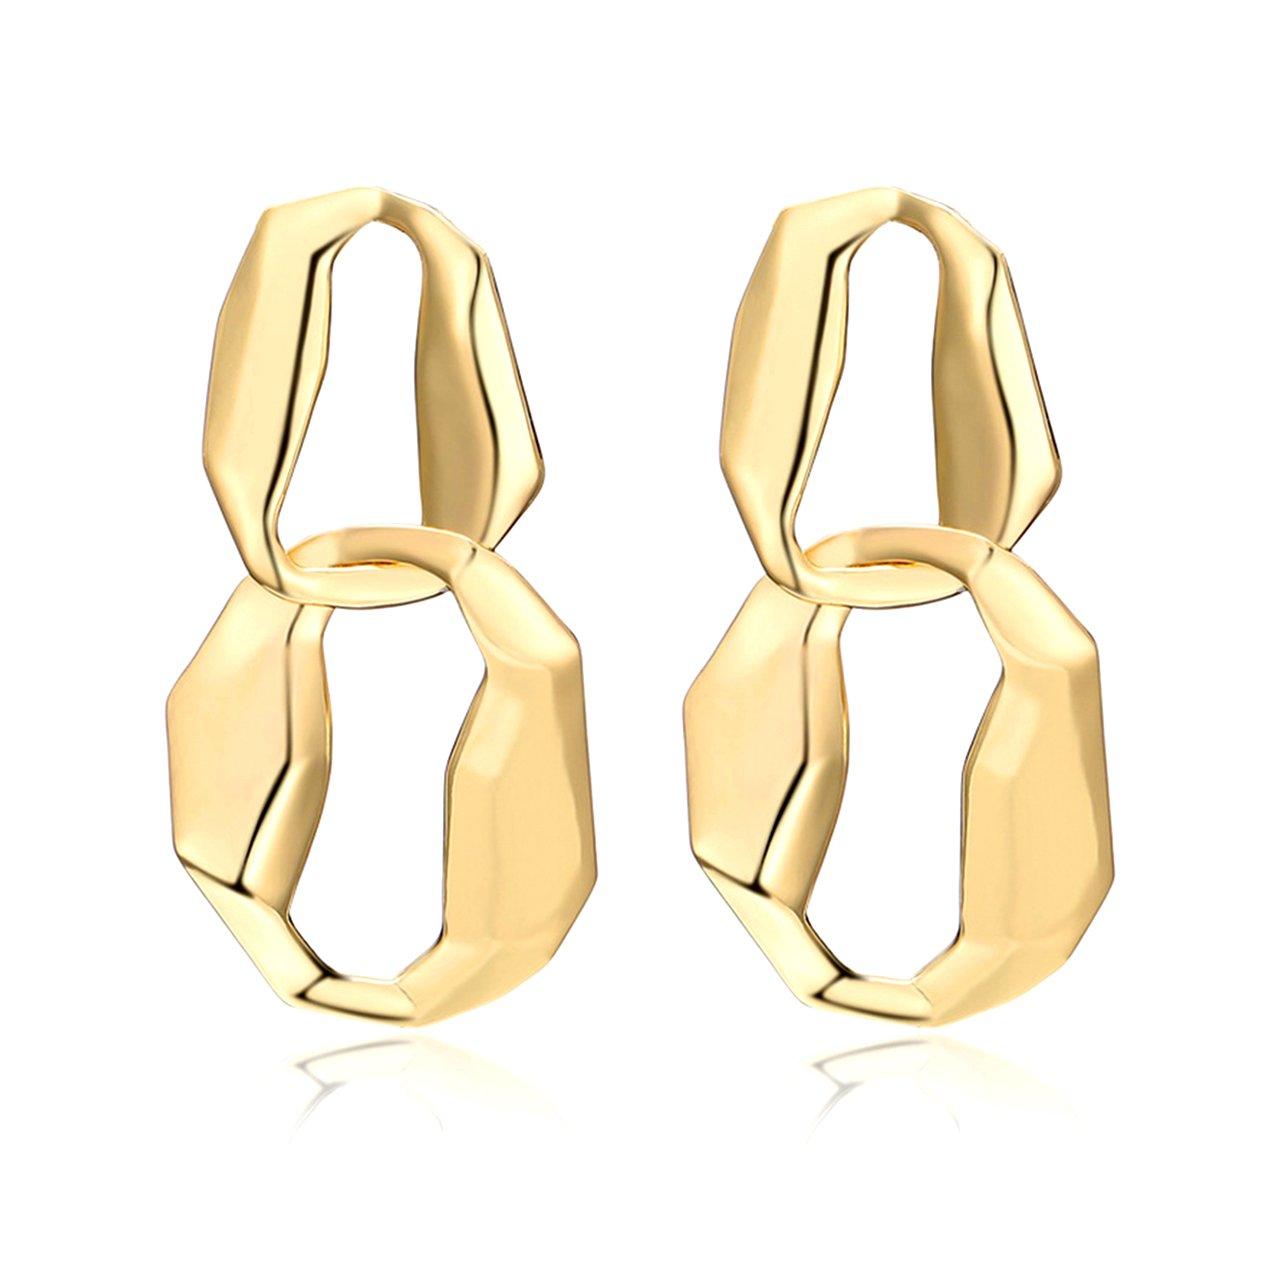 Geerier Double Link Earrings Gold Eight Statement Infinity Earrings for Girls